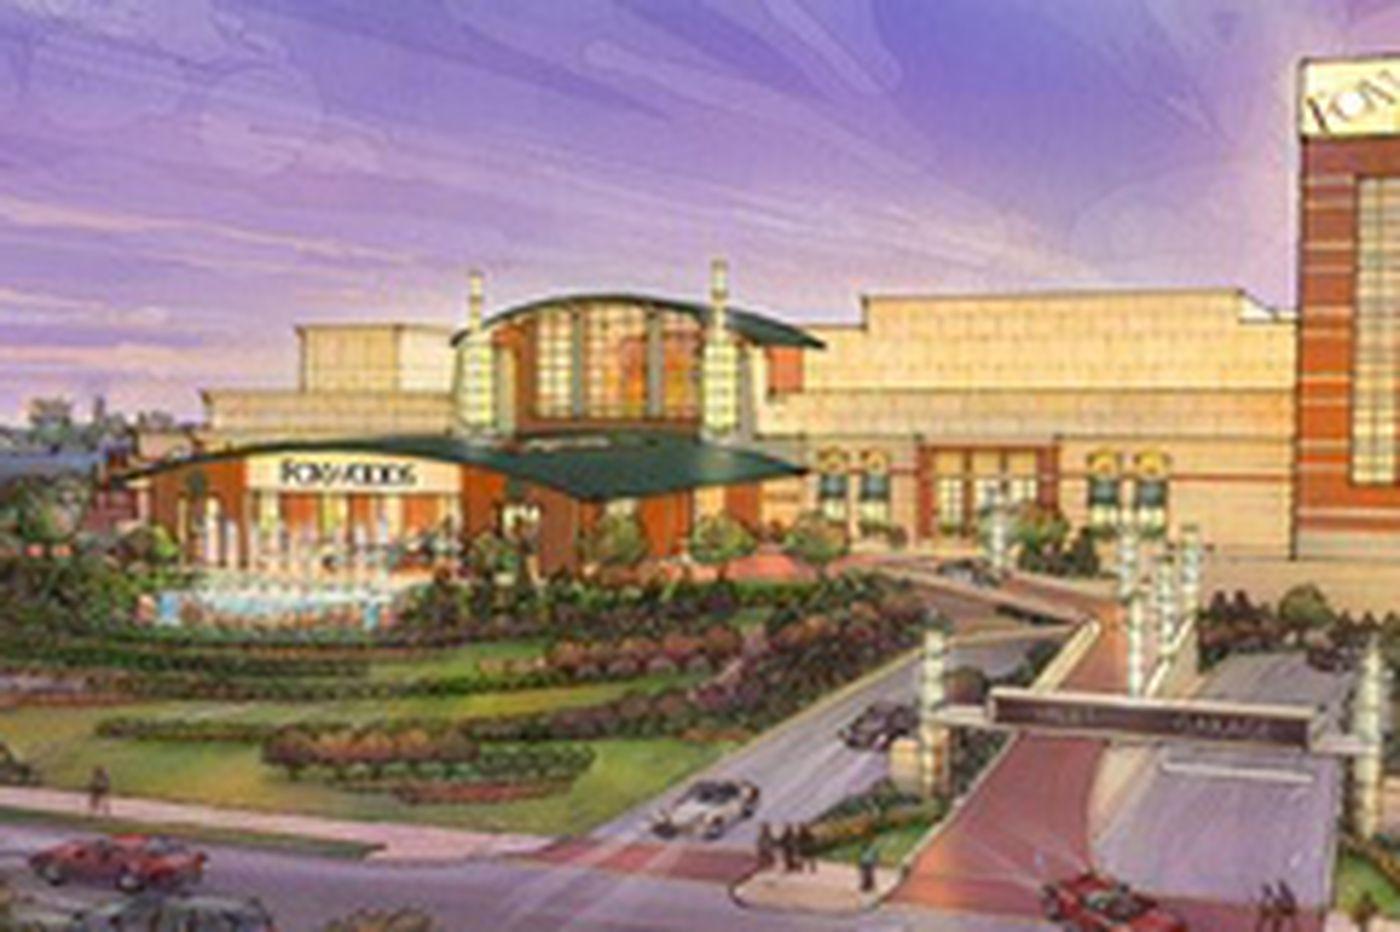 Delays of casinos costing millions